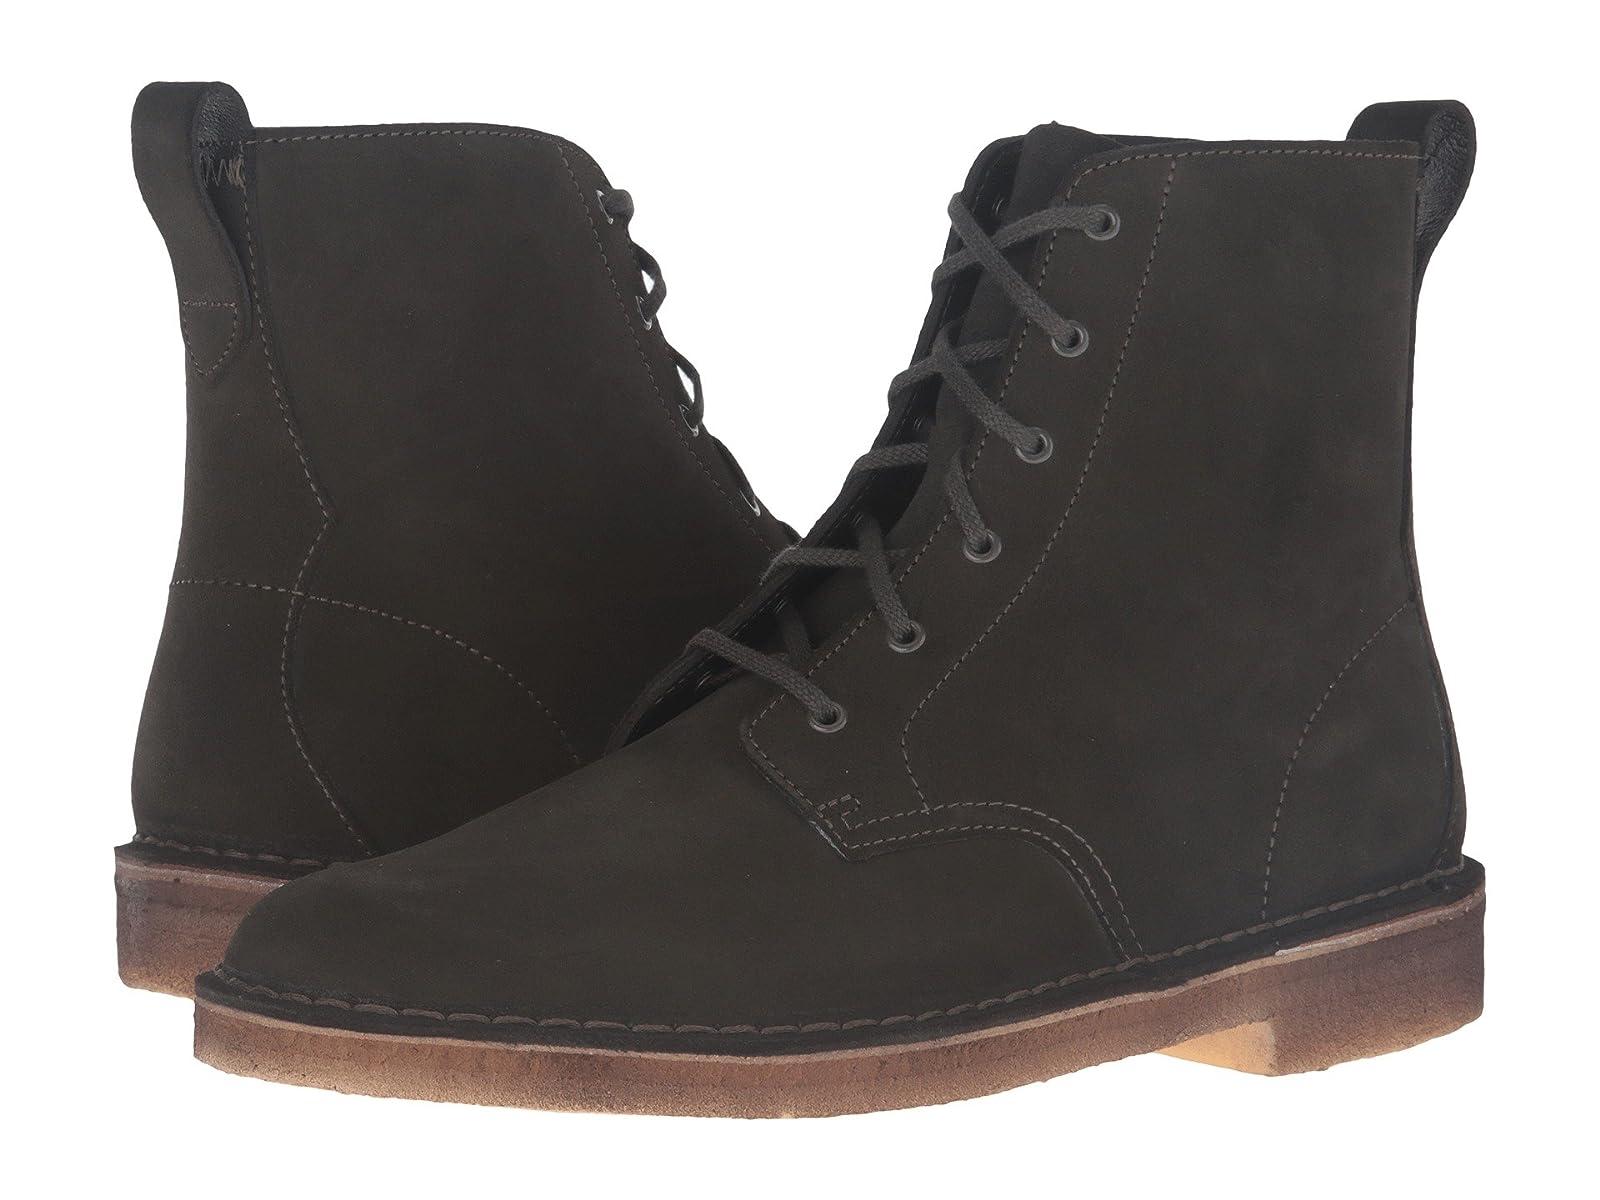 Clarks Desert Mali BootCheap and distinctive eye-catching shoes